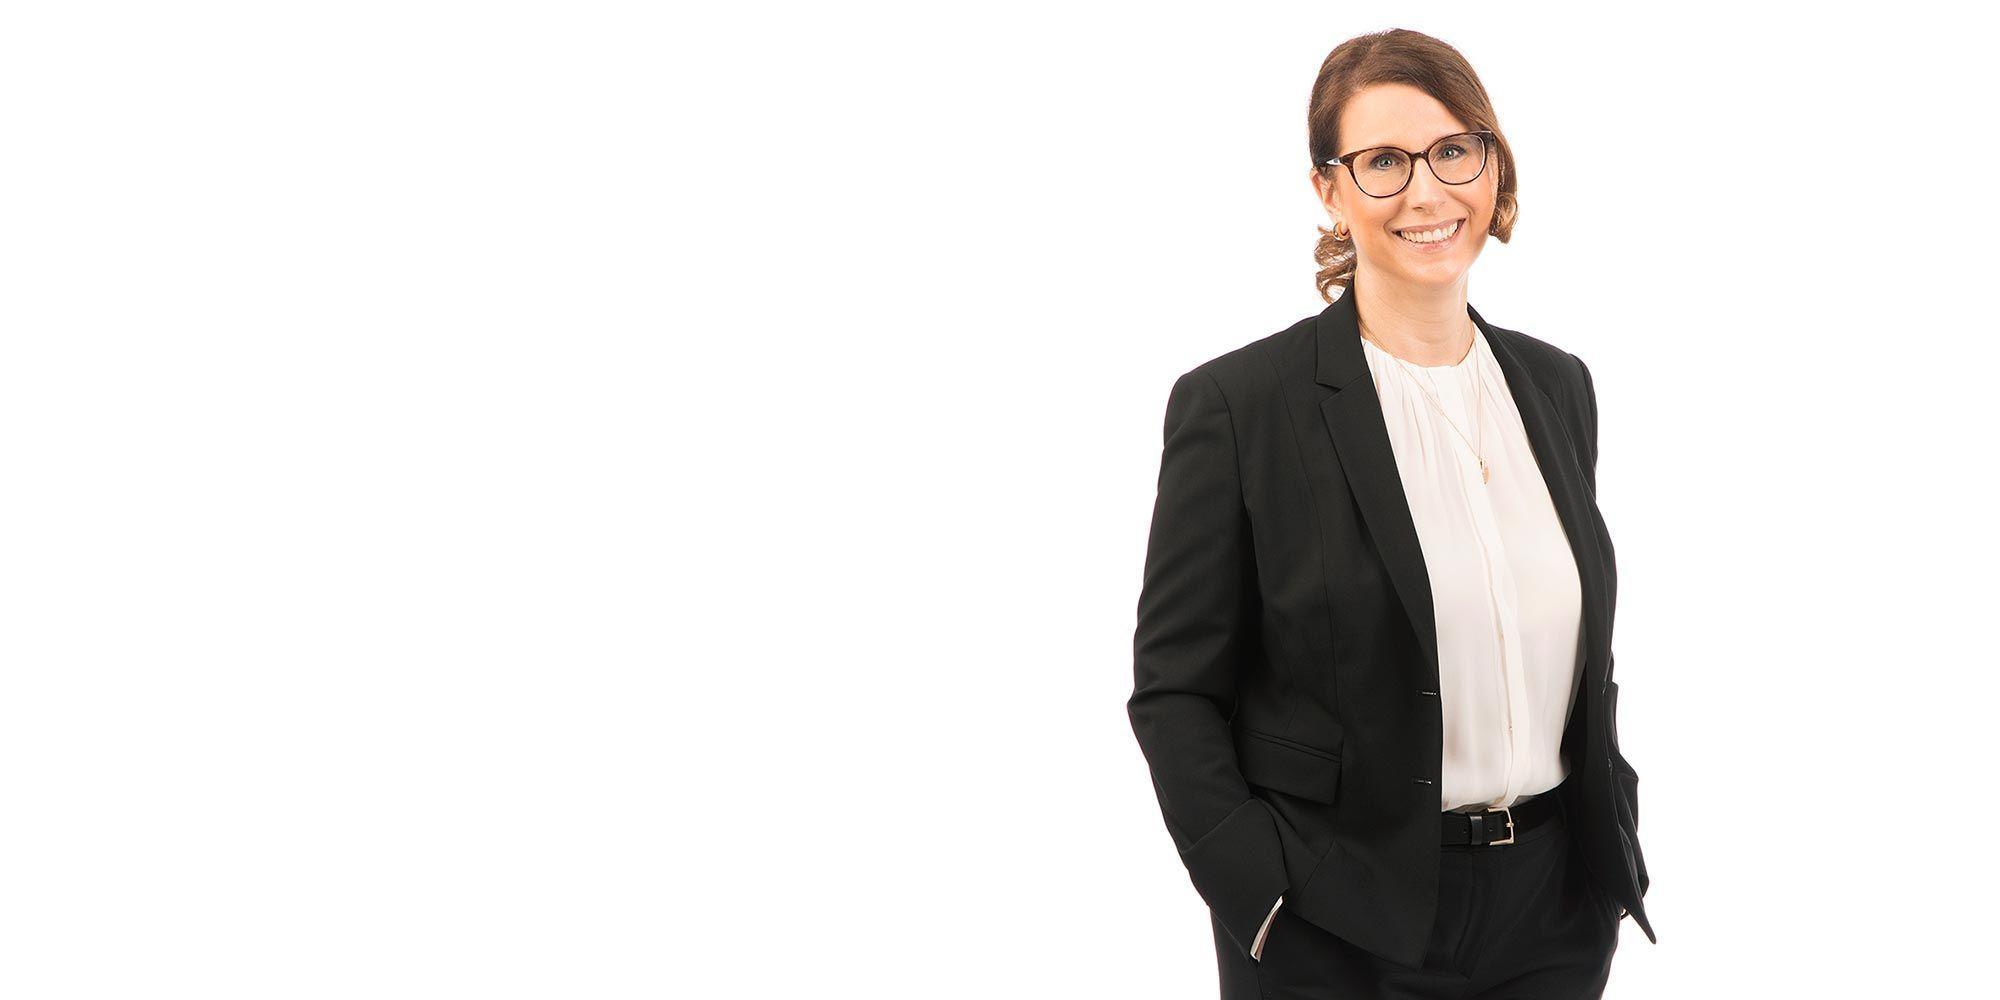 Mediator and lawyer Annette Oschmann